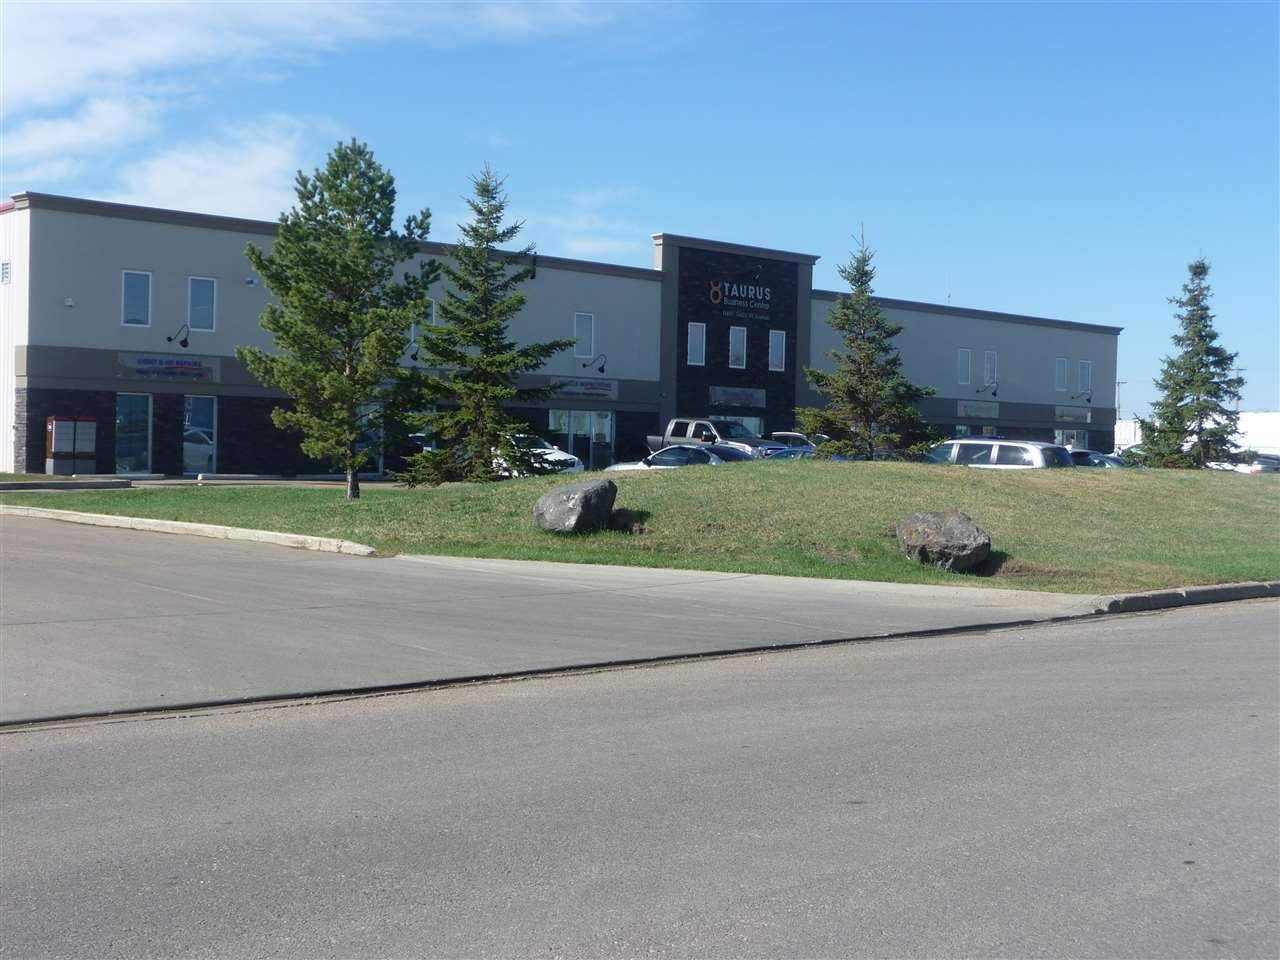 Main Photo: 11401 85 Avenue: Fort Saskatchewan Industrial for sale : MLS®# E4135715